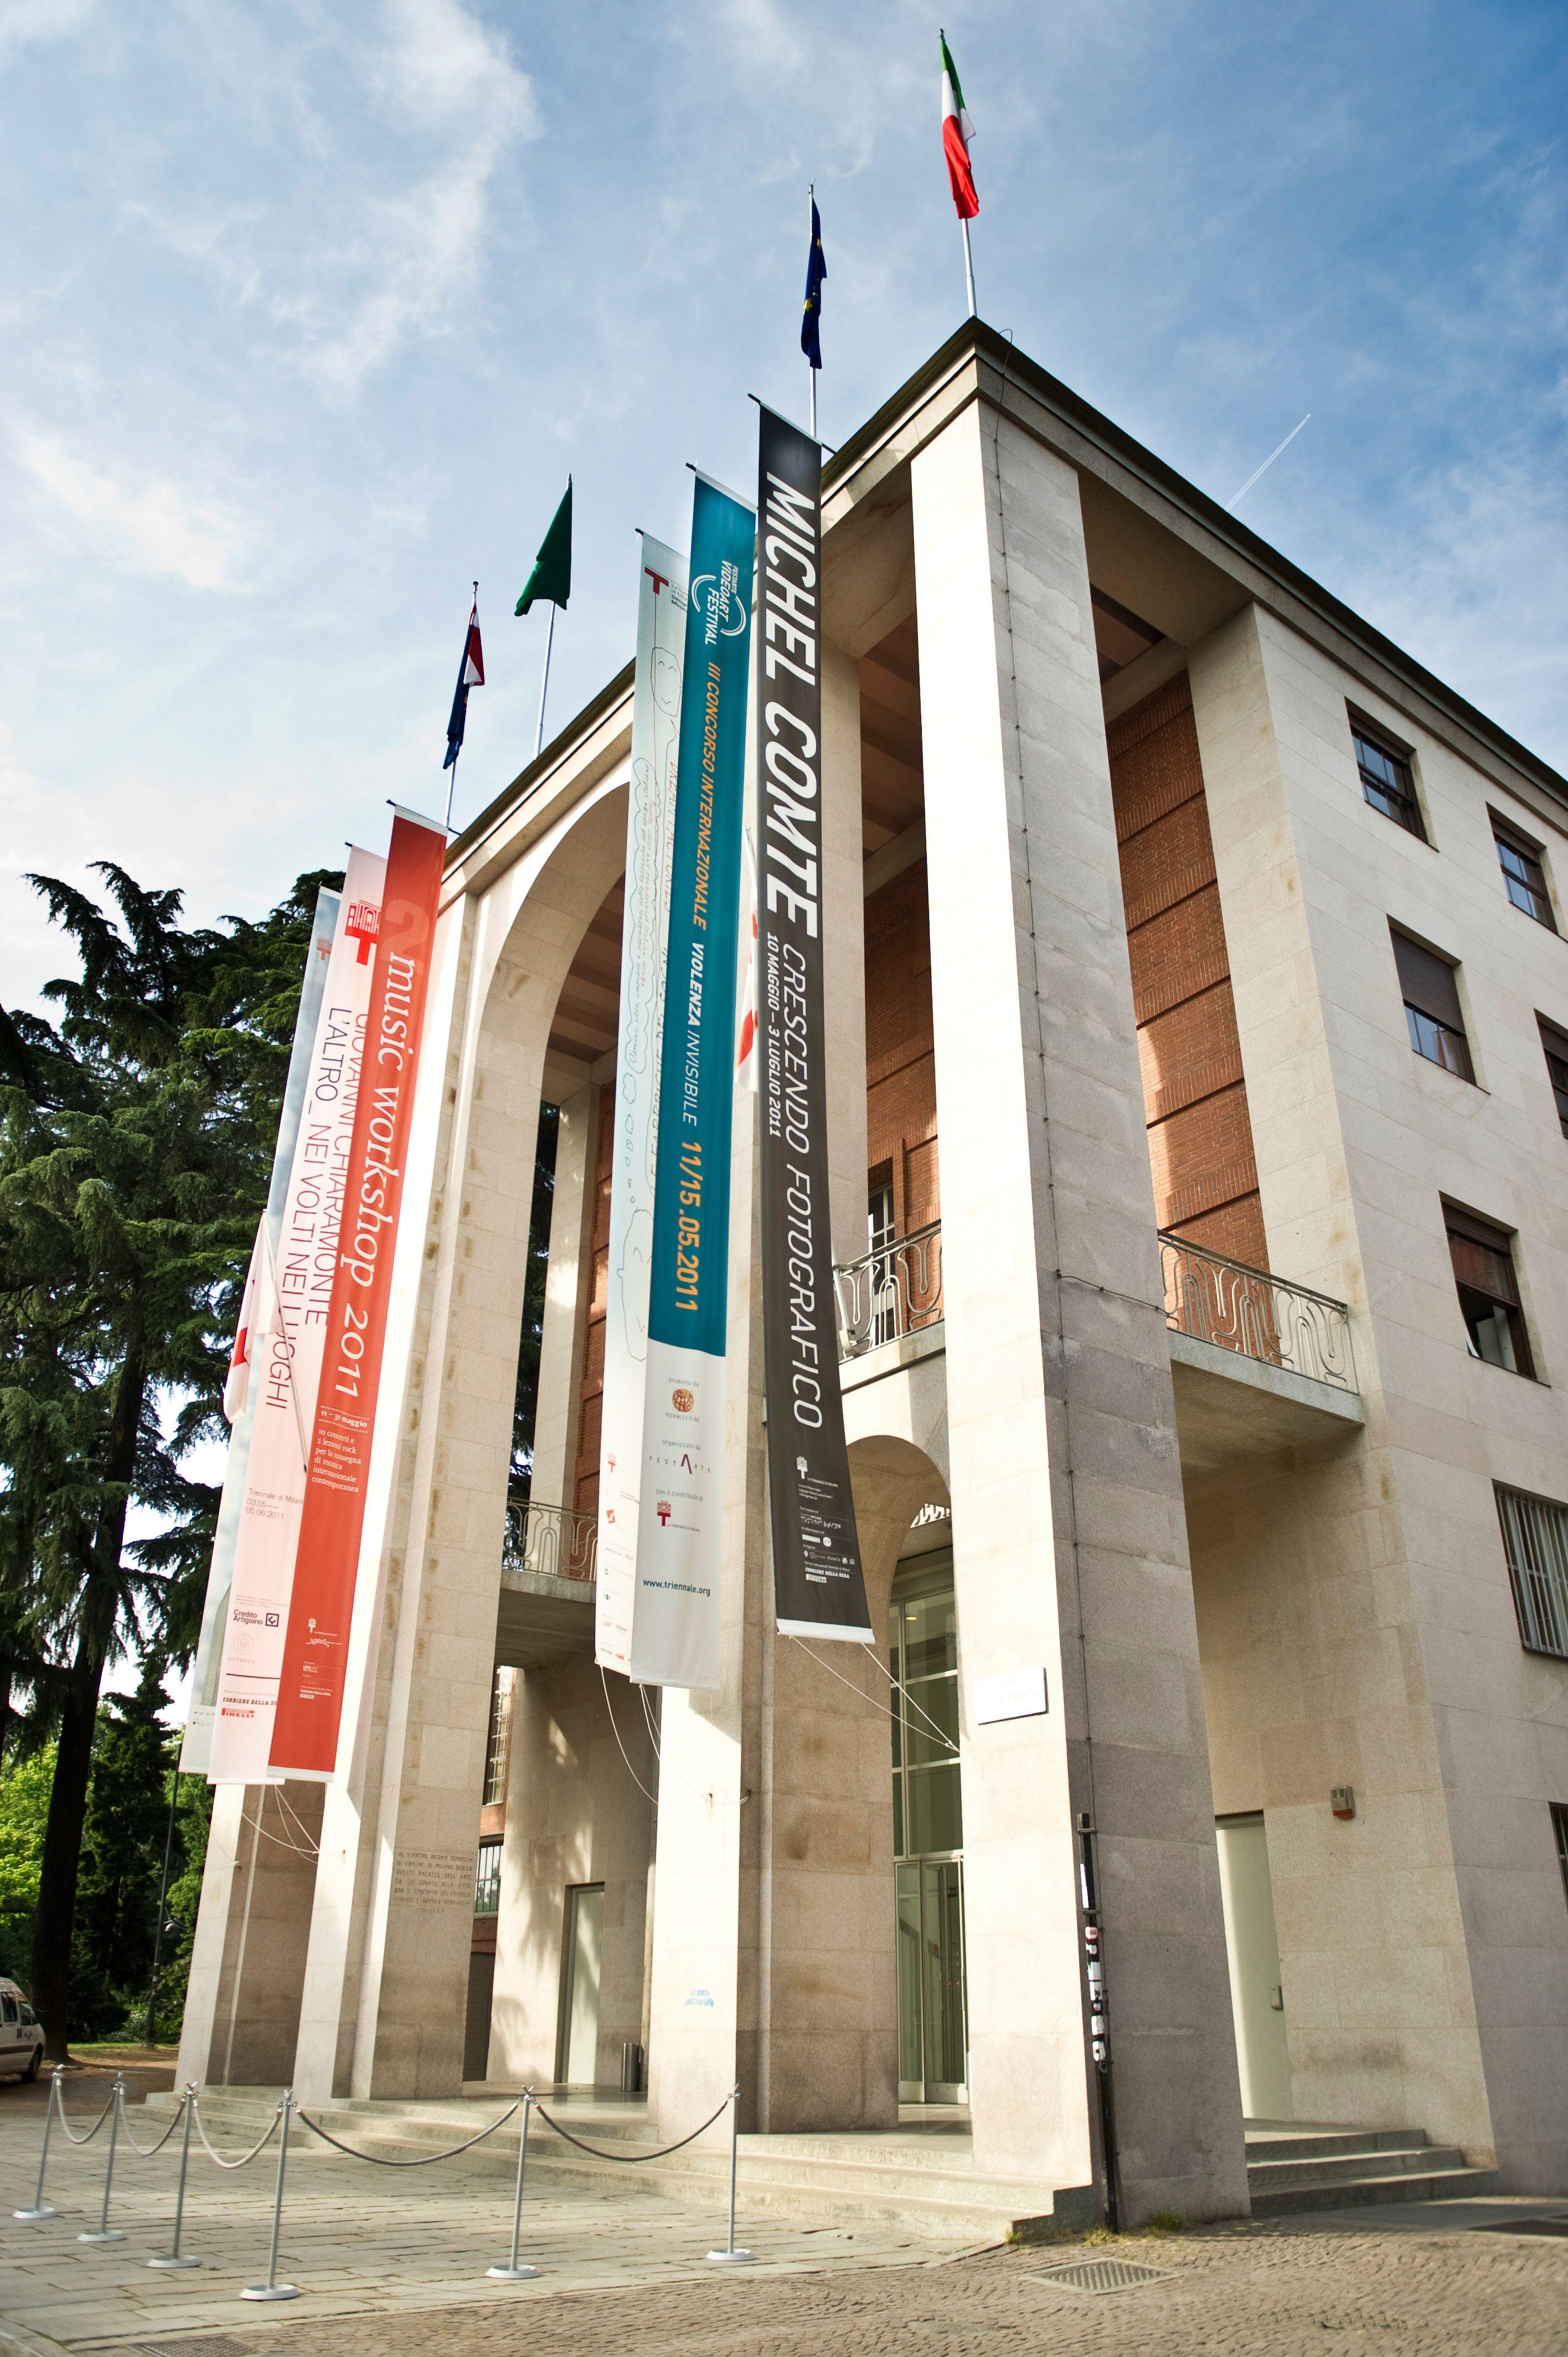 Triennale di Milano - Triennale Design Museum | Viale ...